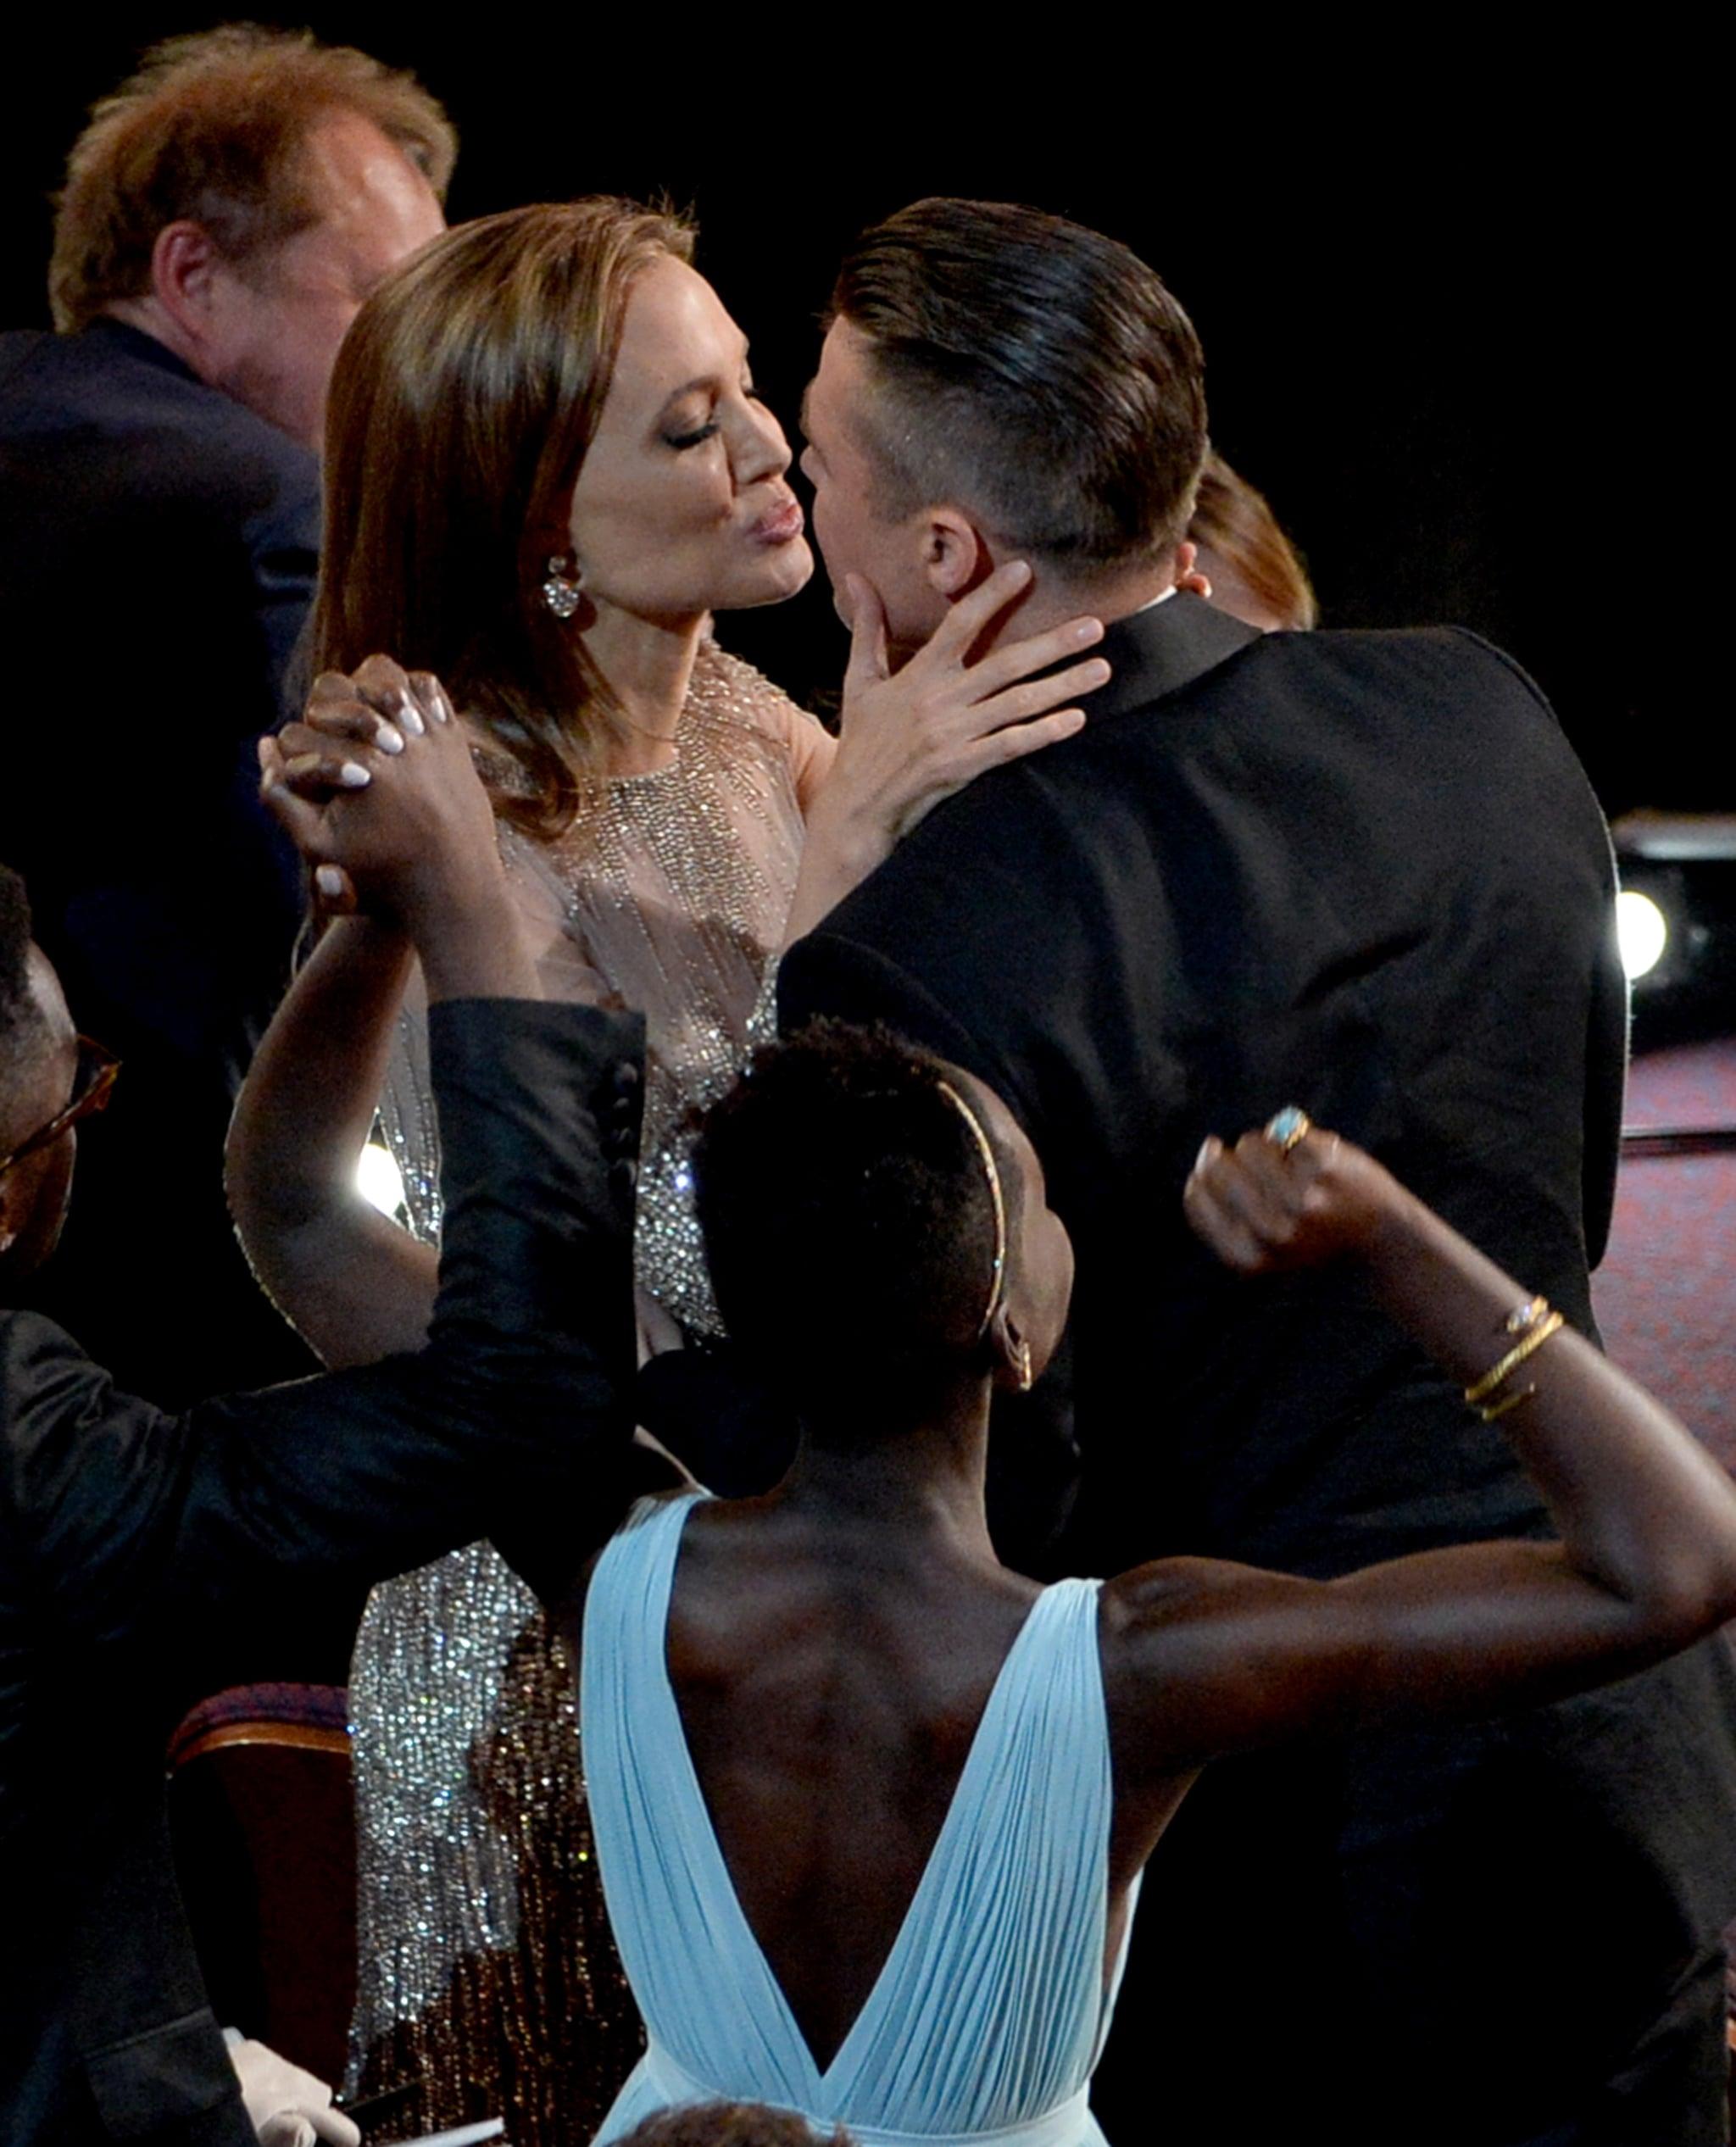 Brad Pitt and Angelina Jolie puckered up at the Oscars.